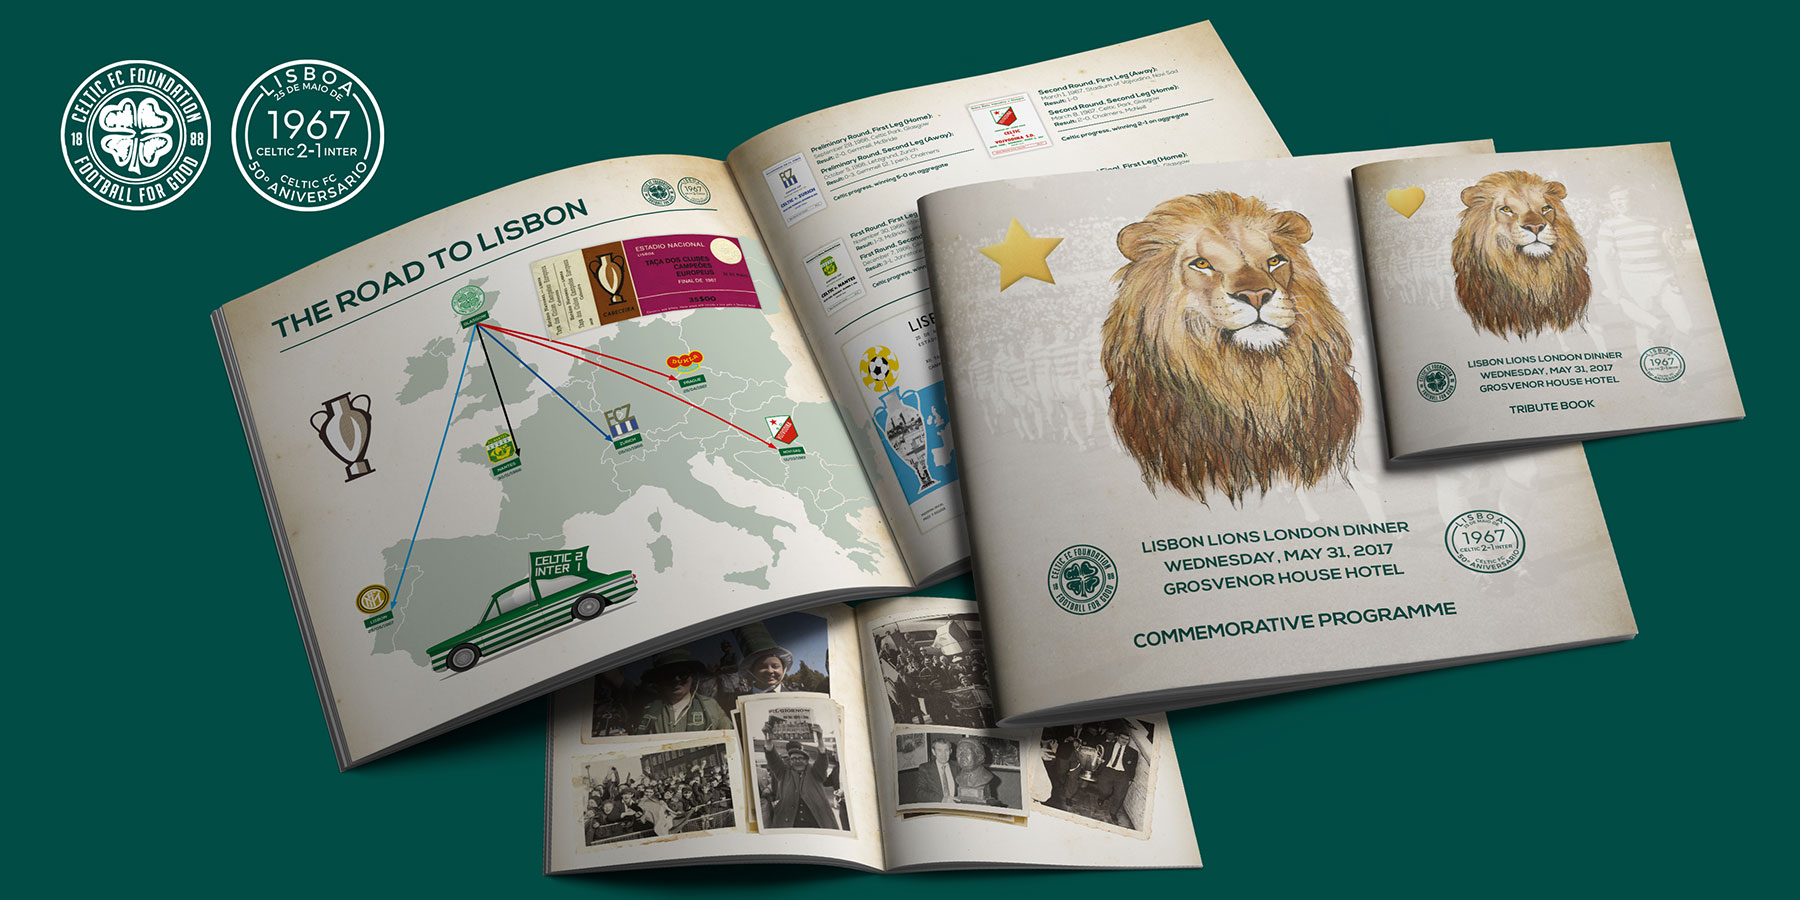 Celtic FC Foundation - Lisbon Lions London Dinner #LionsLegacy